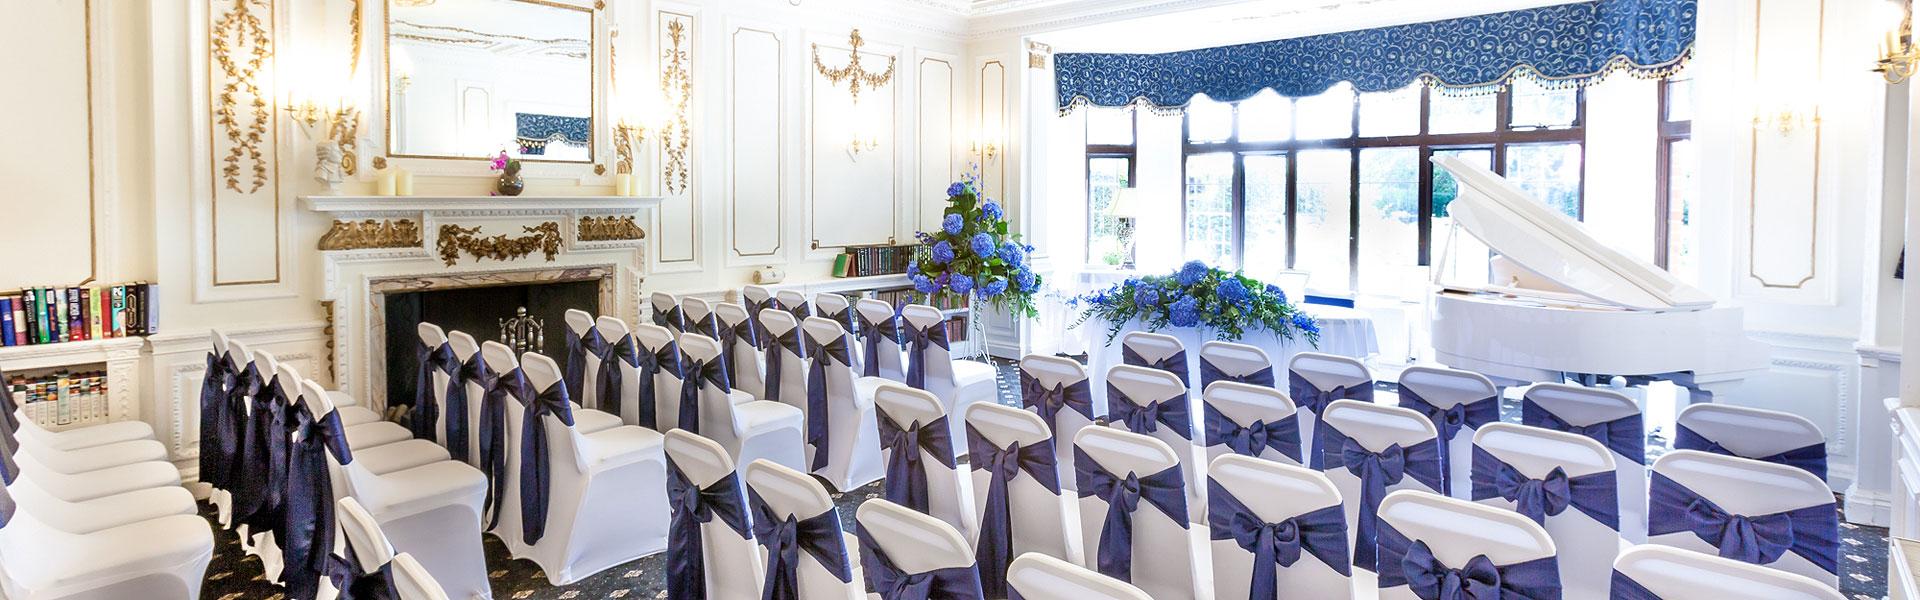 De Rougemont Manor Wedding Venue